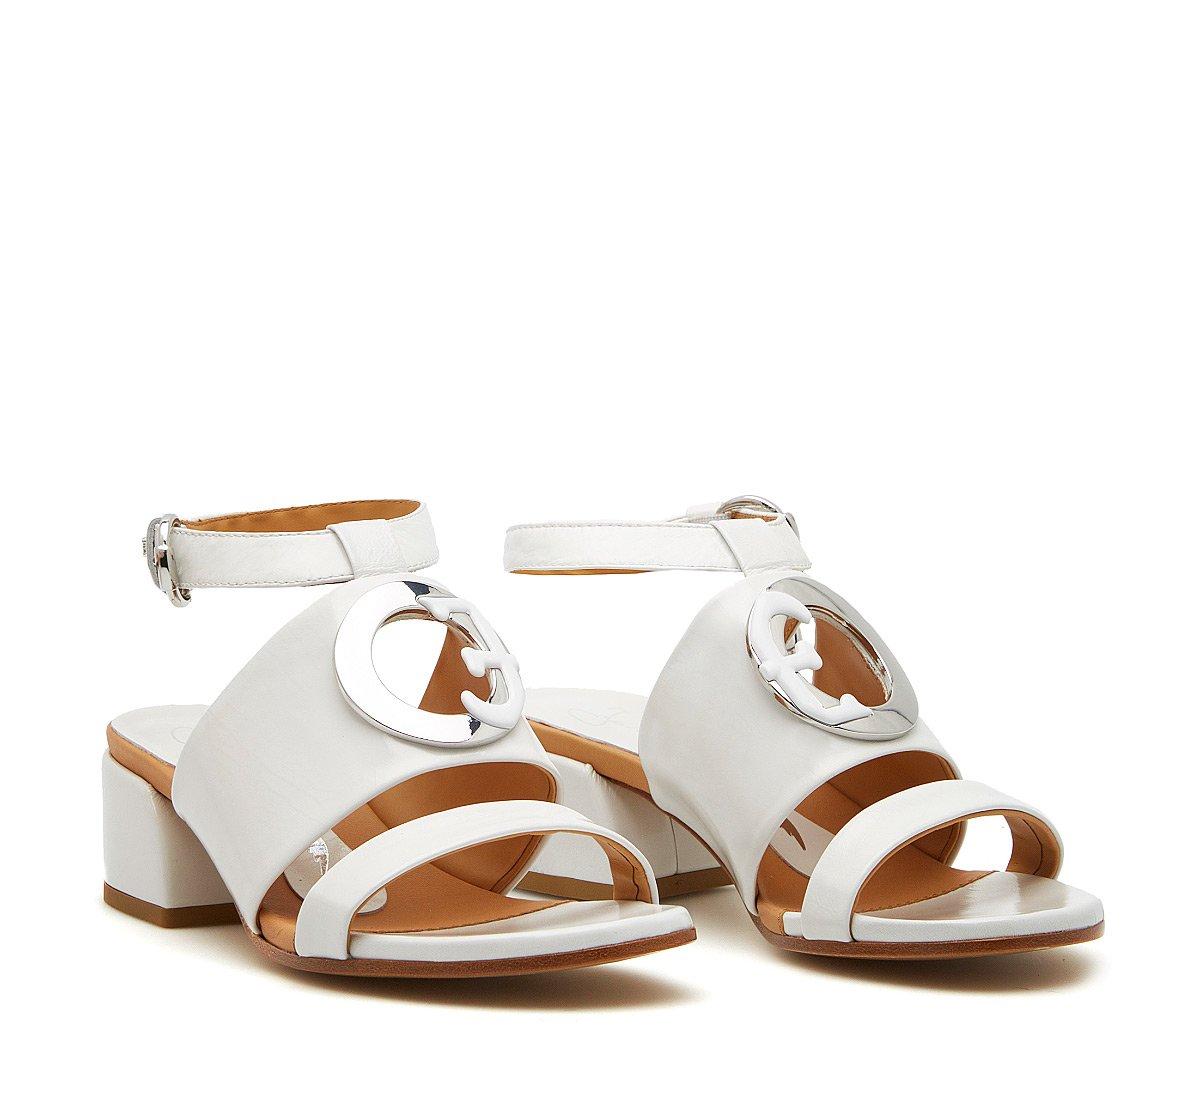 Sandalo Fabi Oblo in vernice